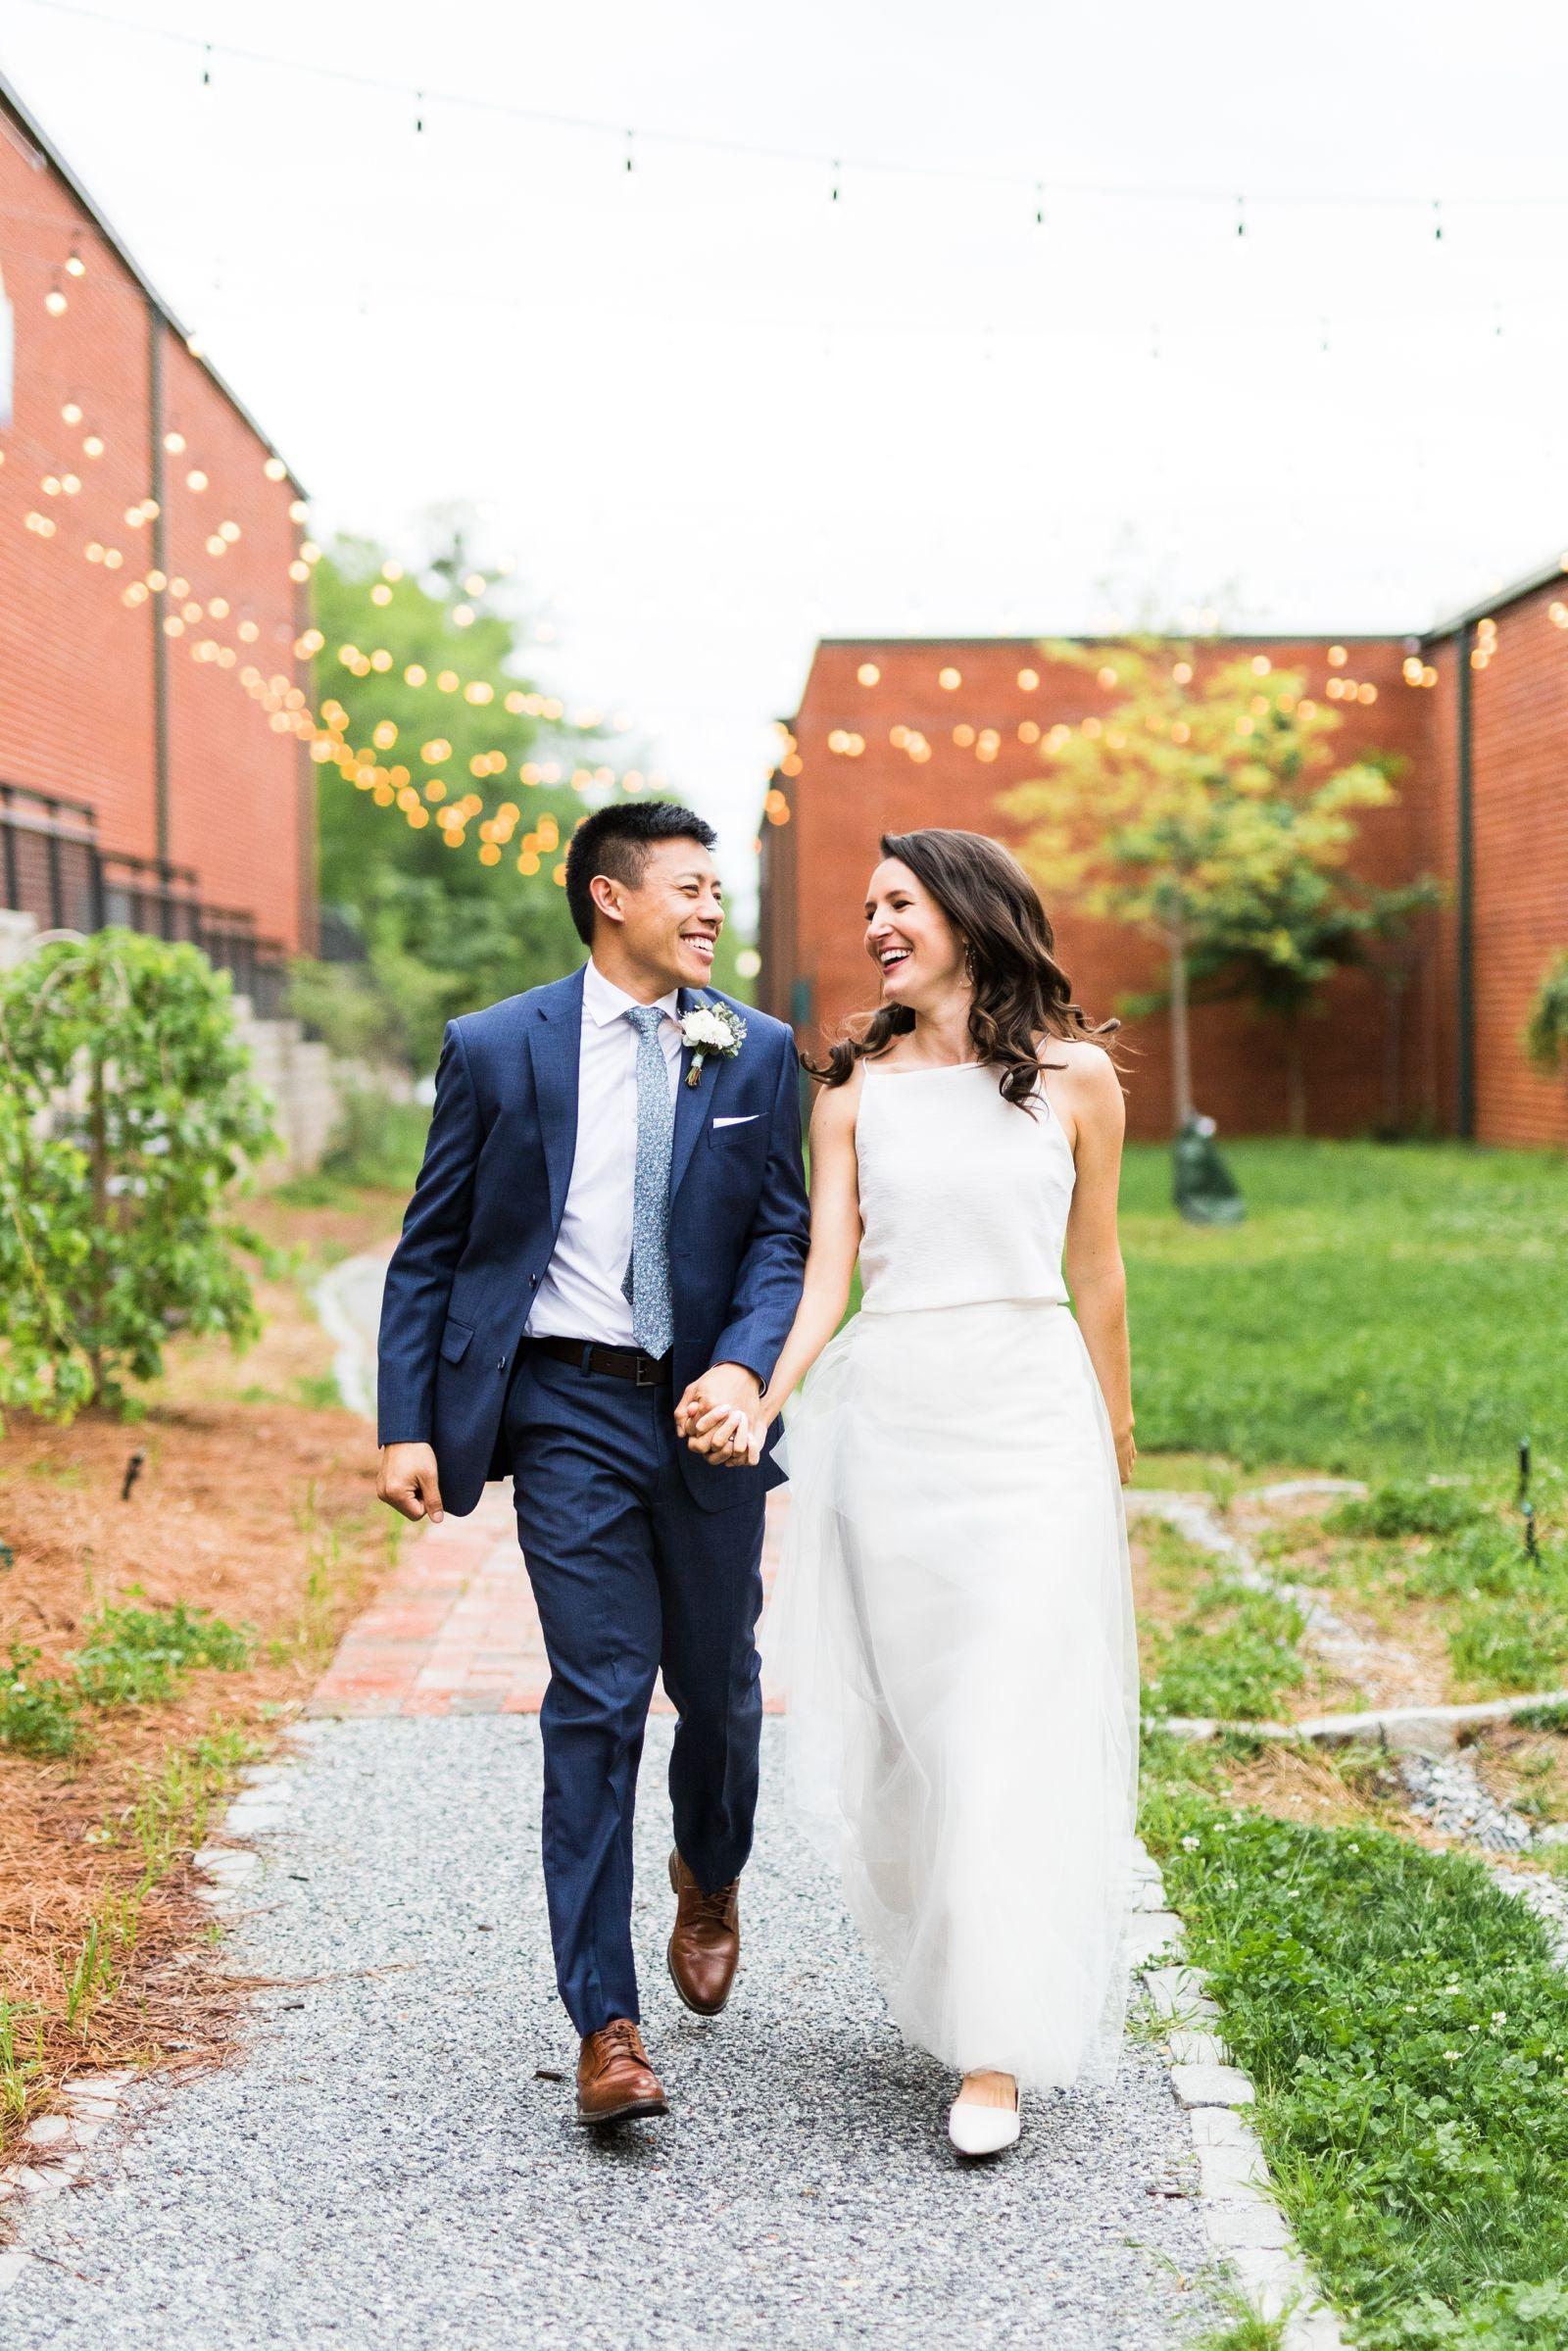 Pin By Katlin Withers On Wedding Pictures I Need Atlanta Wedding Blog Photography Wedding